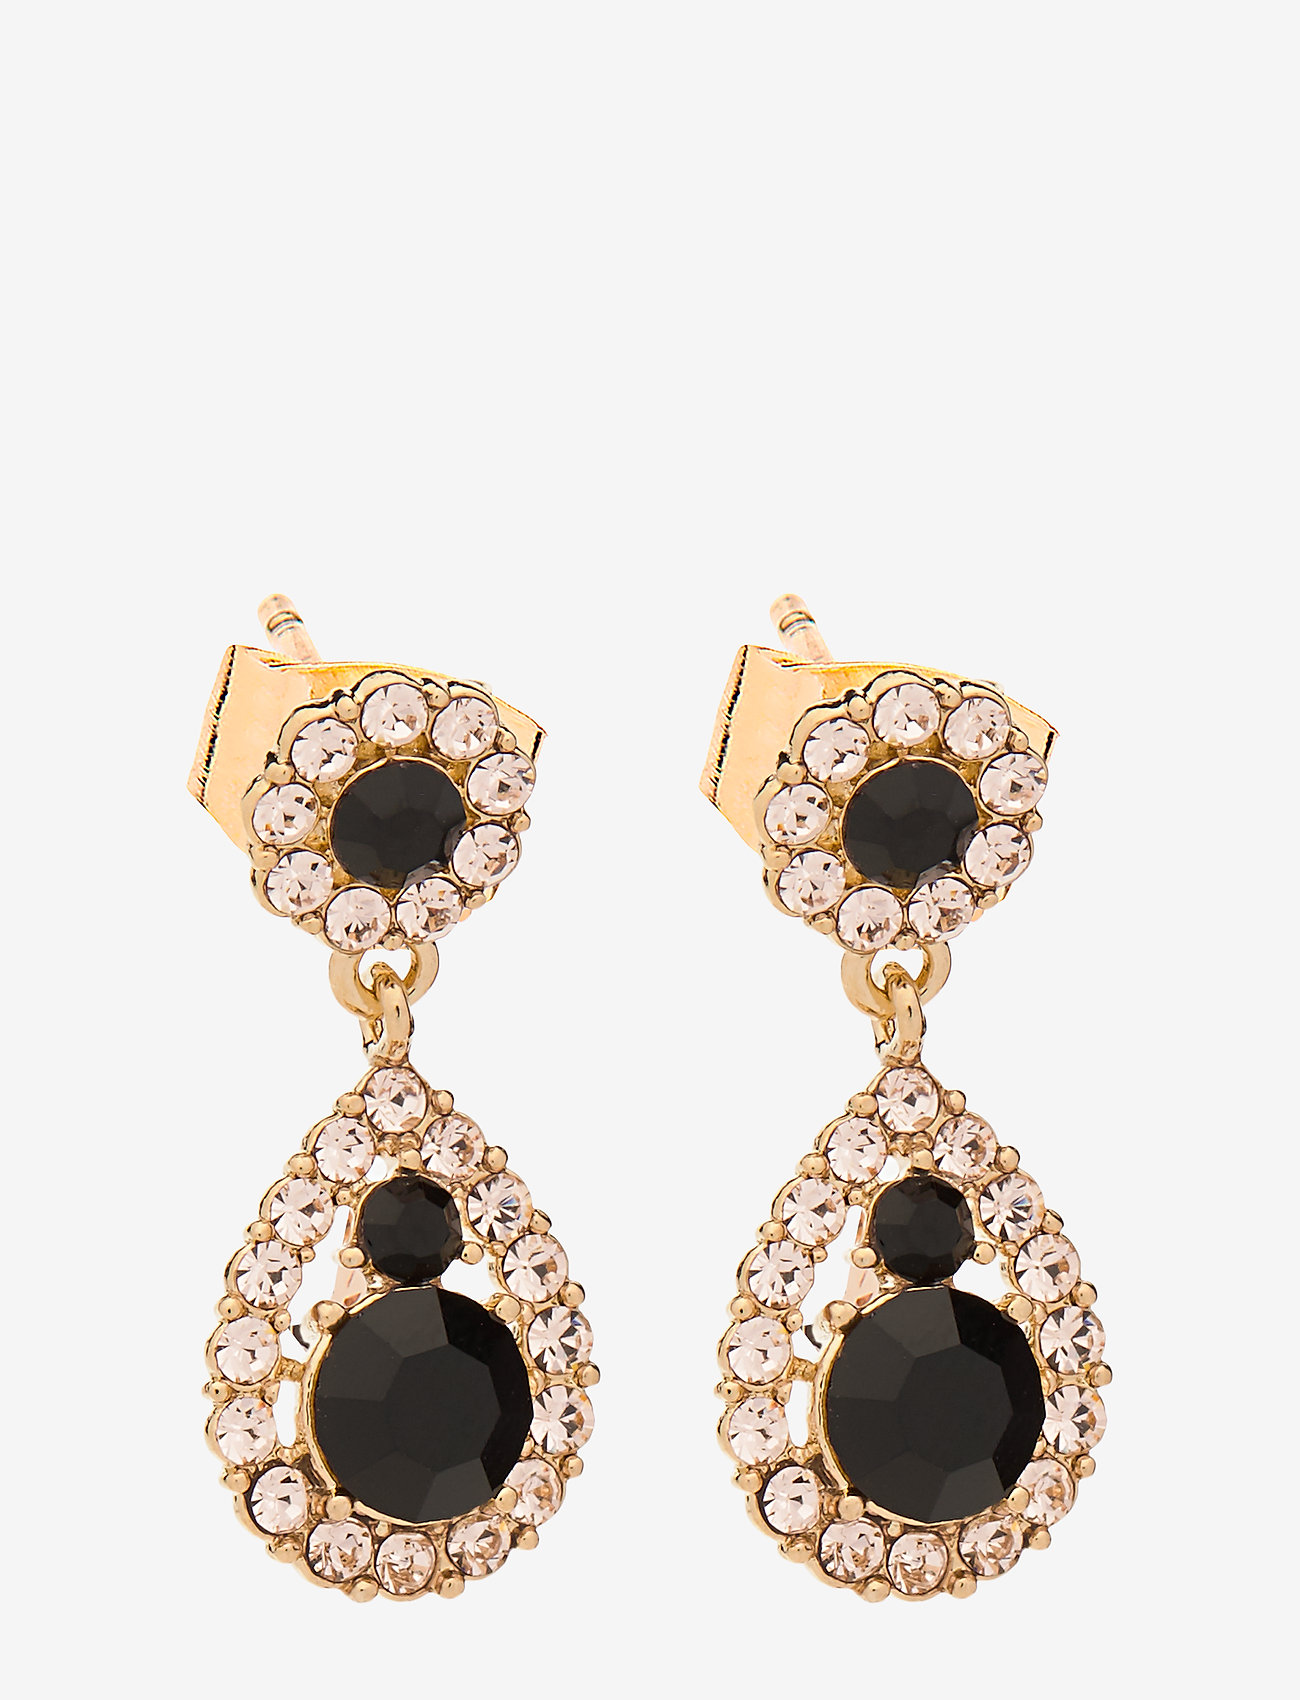 LILY AND ROSE - Petite Sofia earrings - Jet - pendant - jet